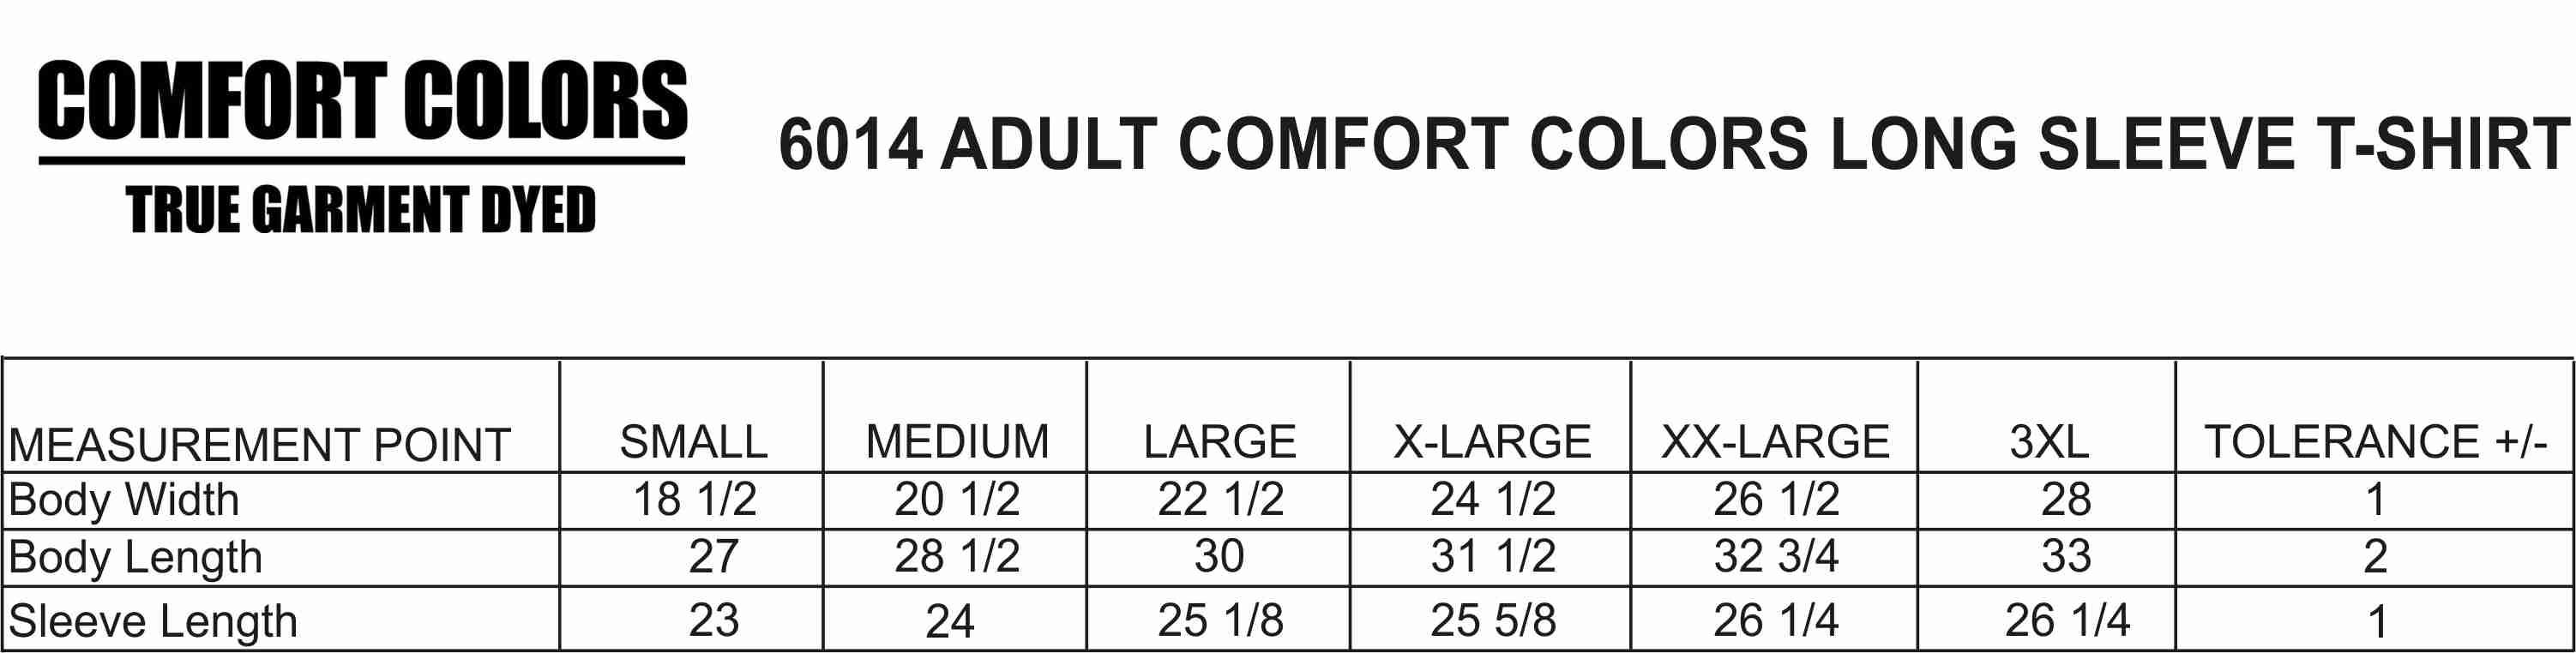 Comfort Colors Long Sleeve Shirt (6014/3483) | Moonlight Threads